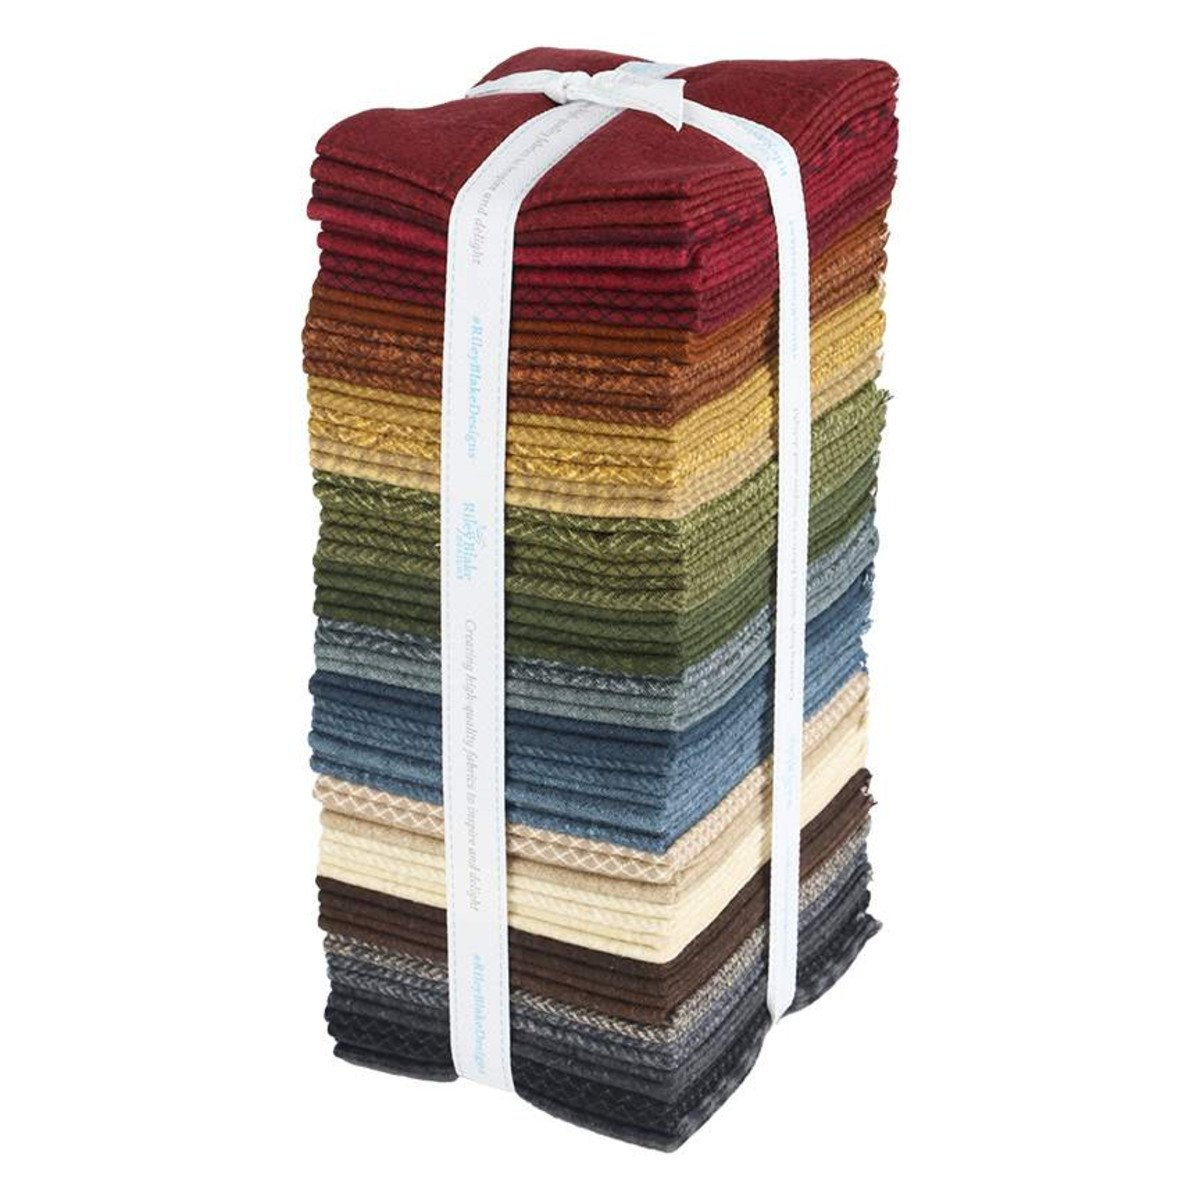 Woolen Flannel Fat Quarter, 32pcs